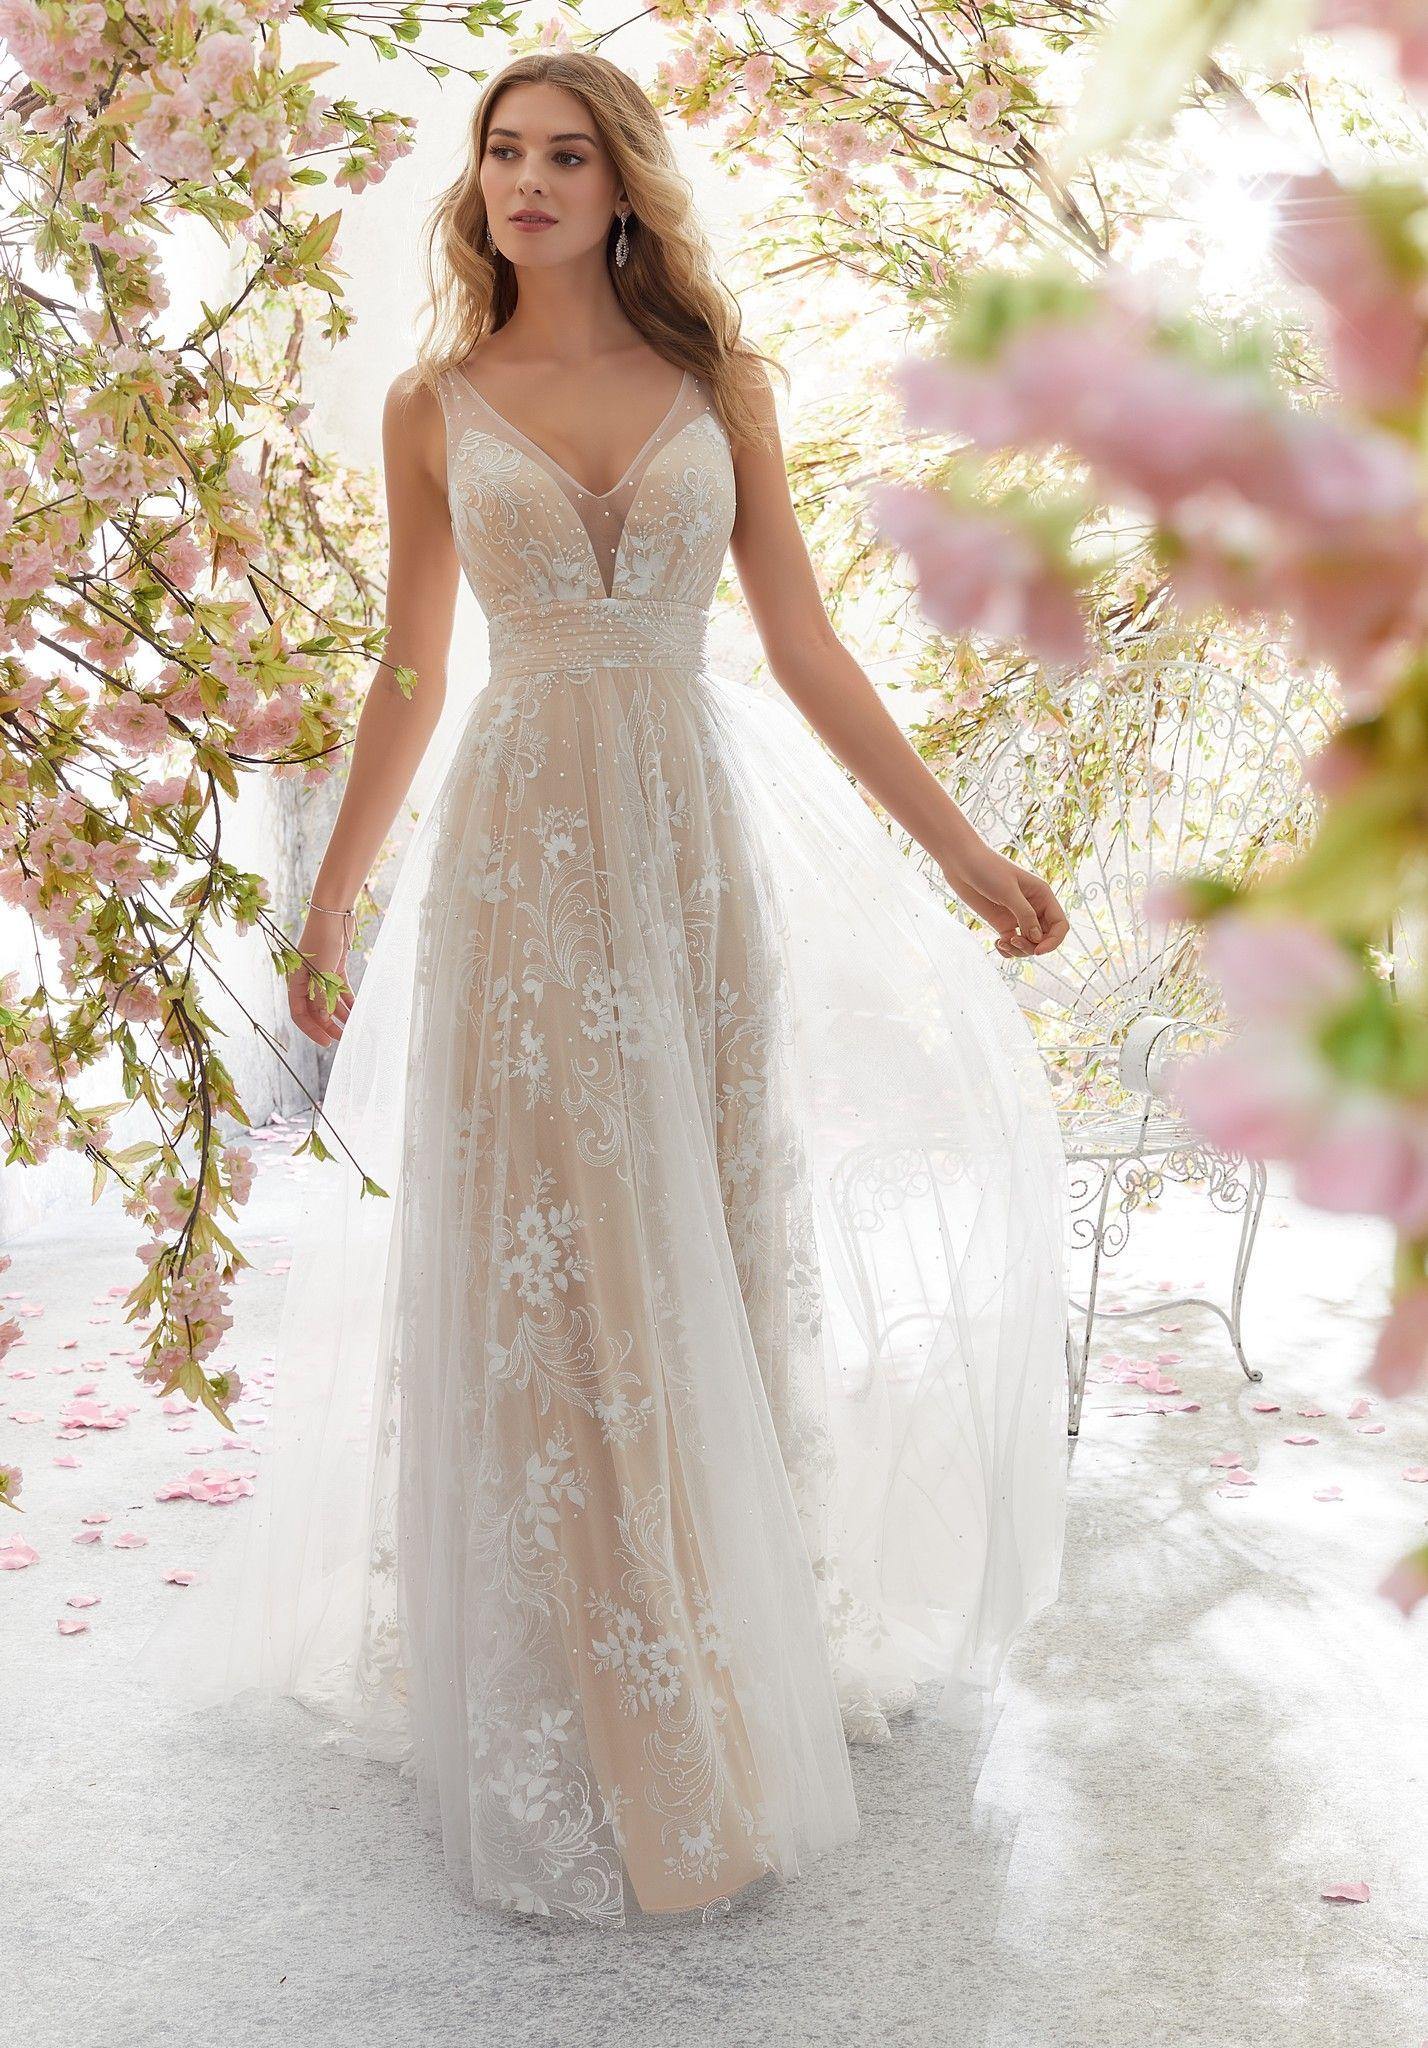 Wedding dresses beach  I just canut get over how beautiful todayus wedding dresses are